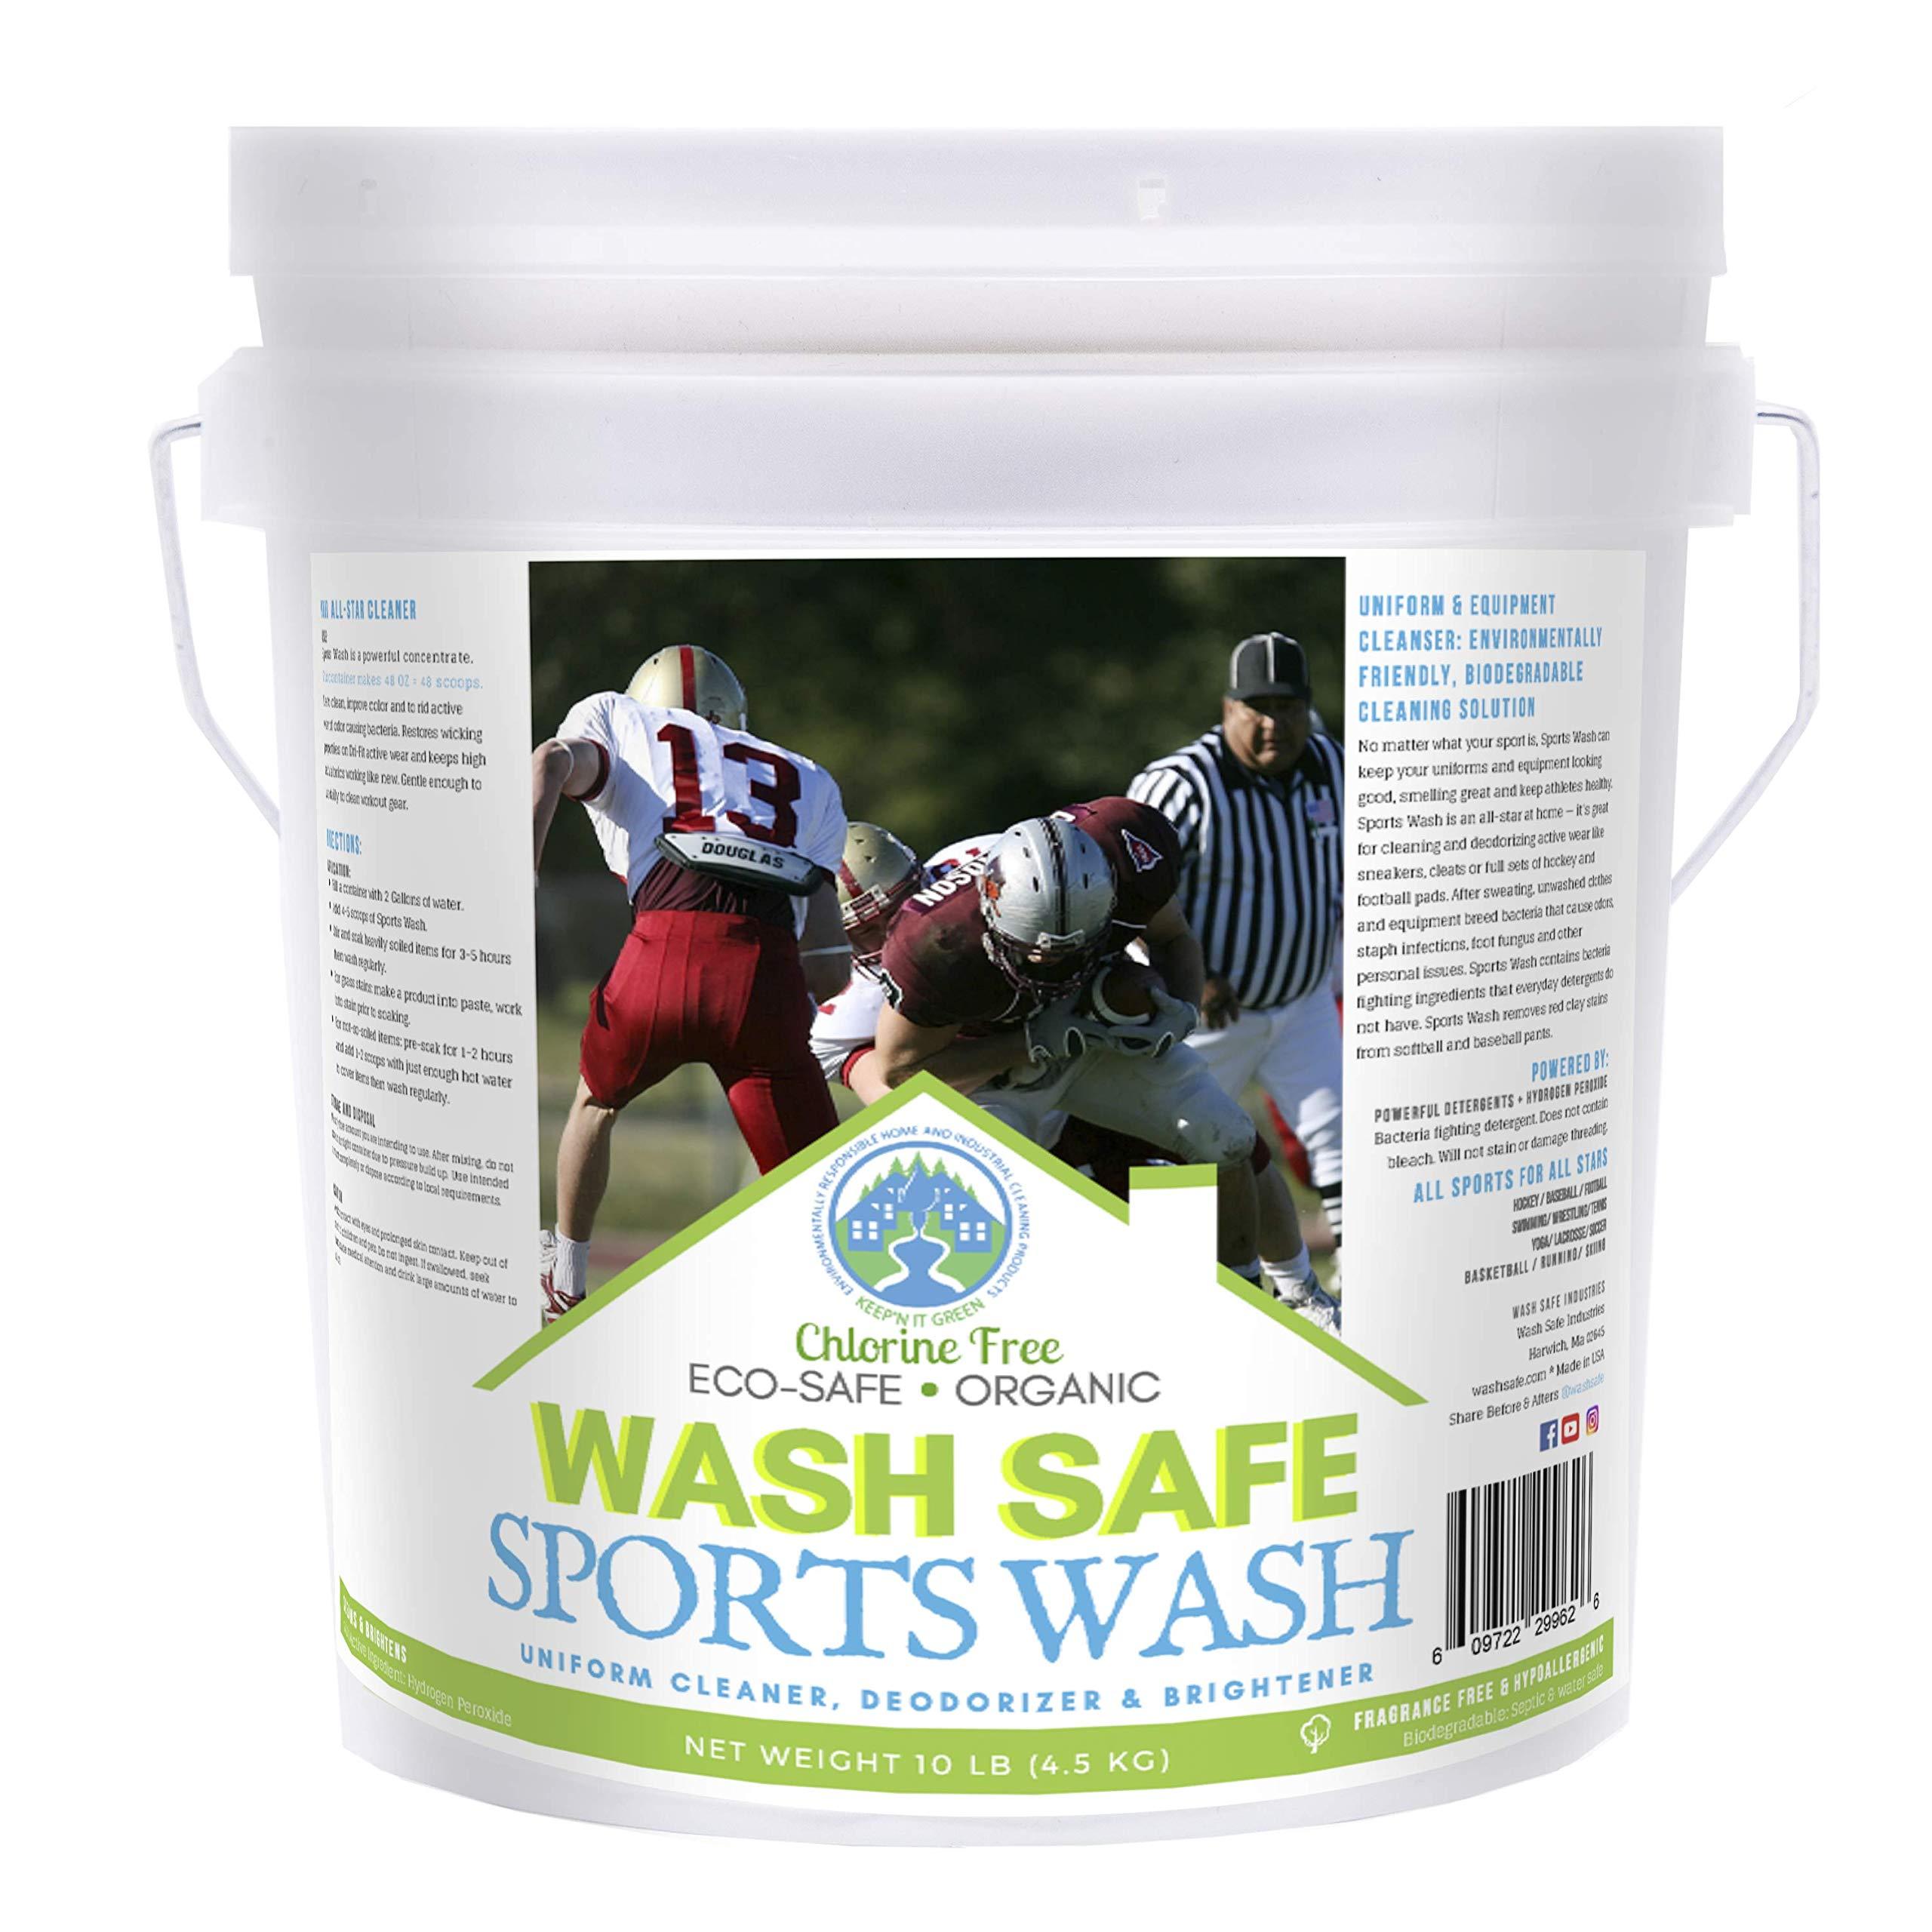 Wash Safe Industries All Star Sports Wash Laundry Detergent Powder by Wash Safe Industries